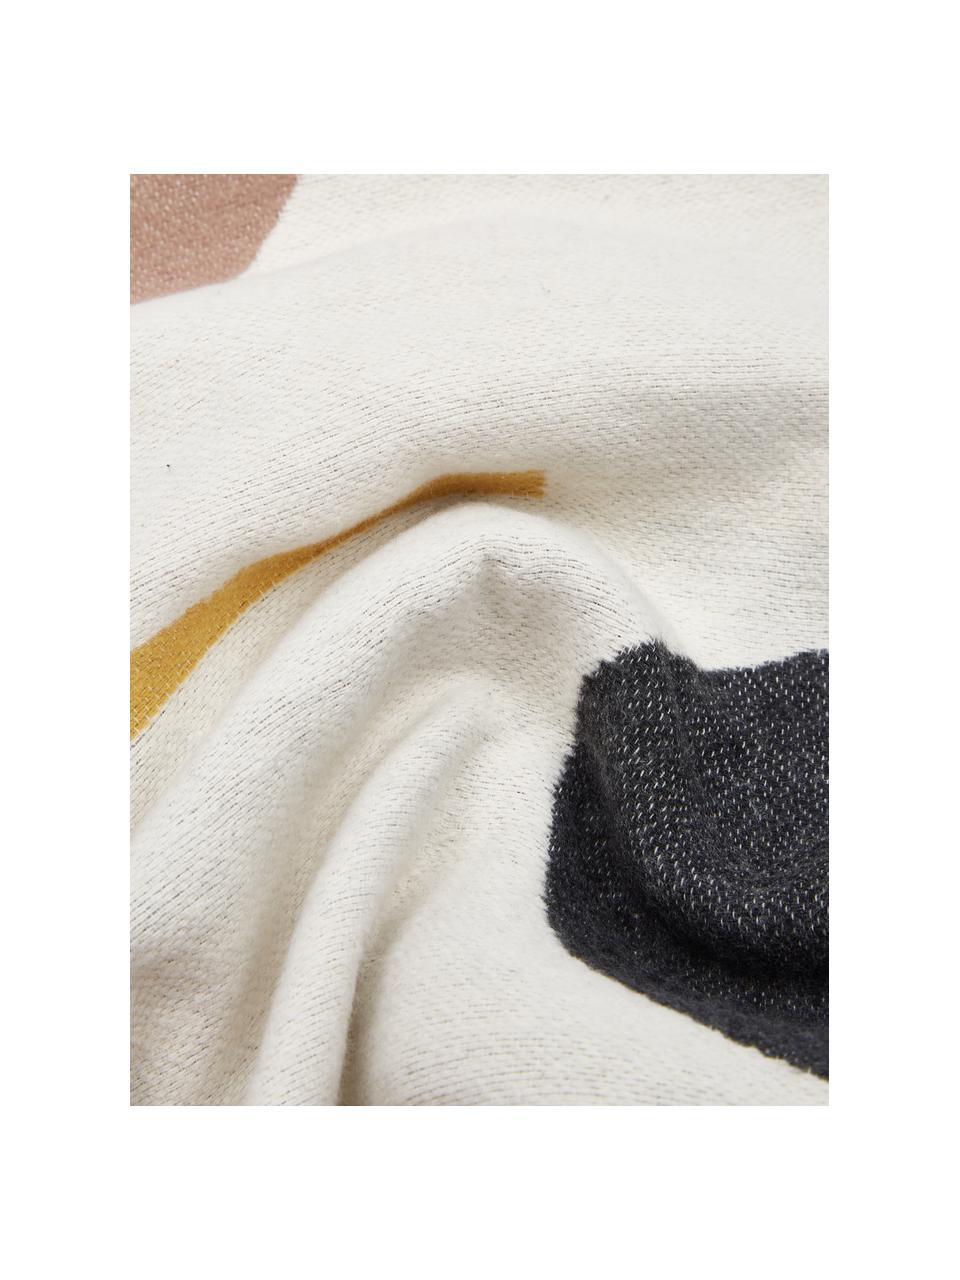 Kussenhoes Nova met abstract patroon, 85% katoen, 8% viscose, 7% polyacryl, Crèmekleurig, multicolour, 40 x 60 cm